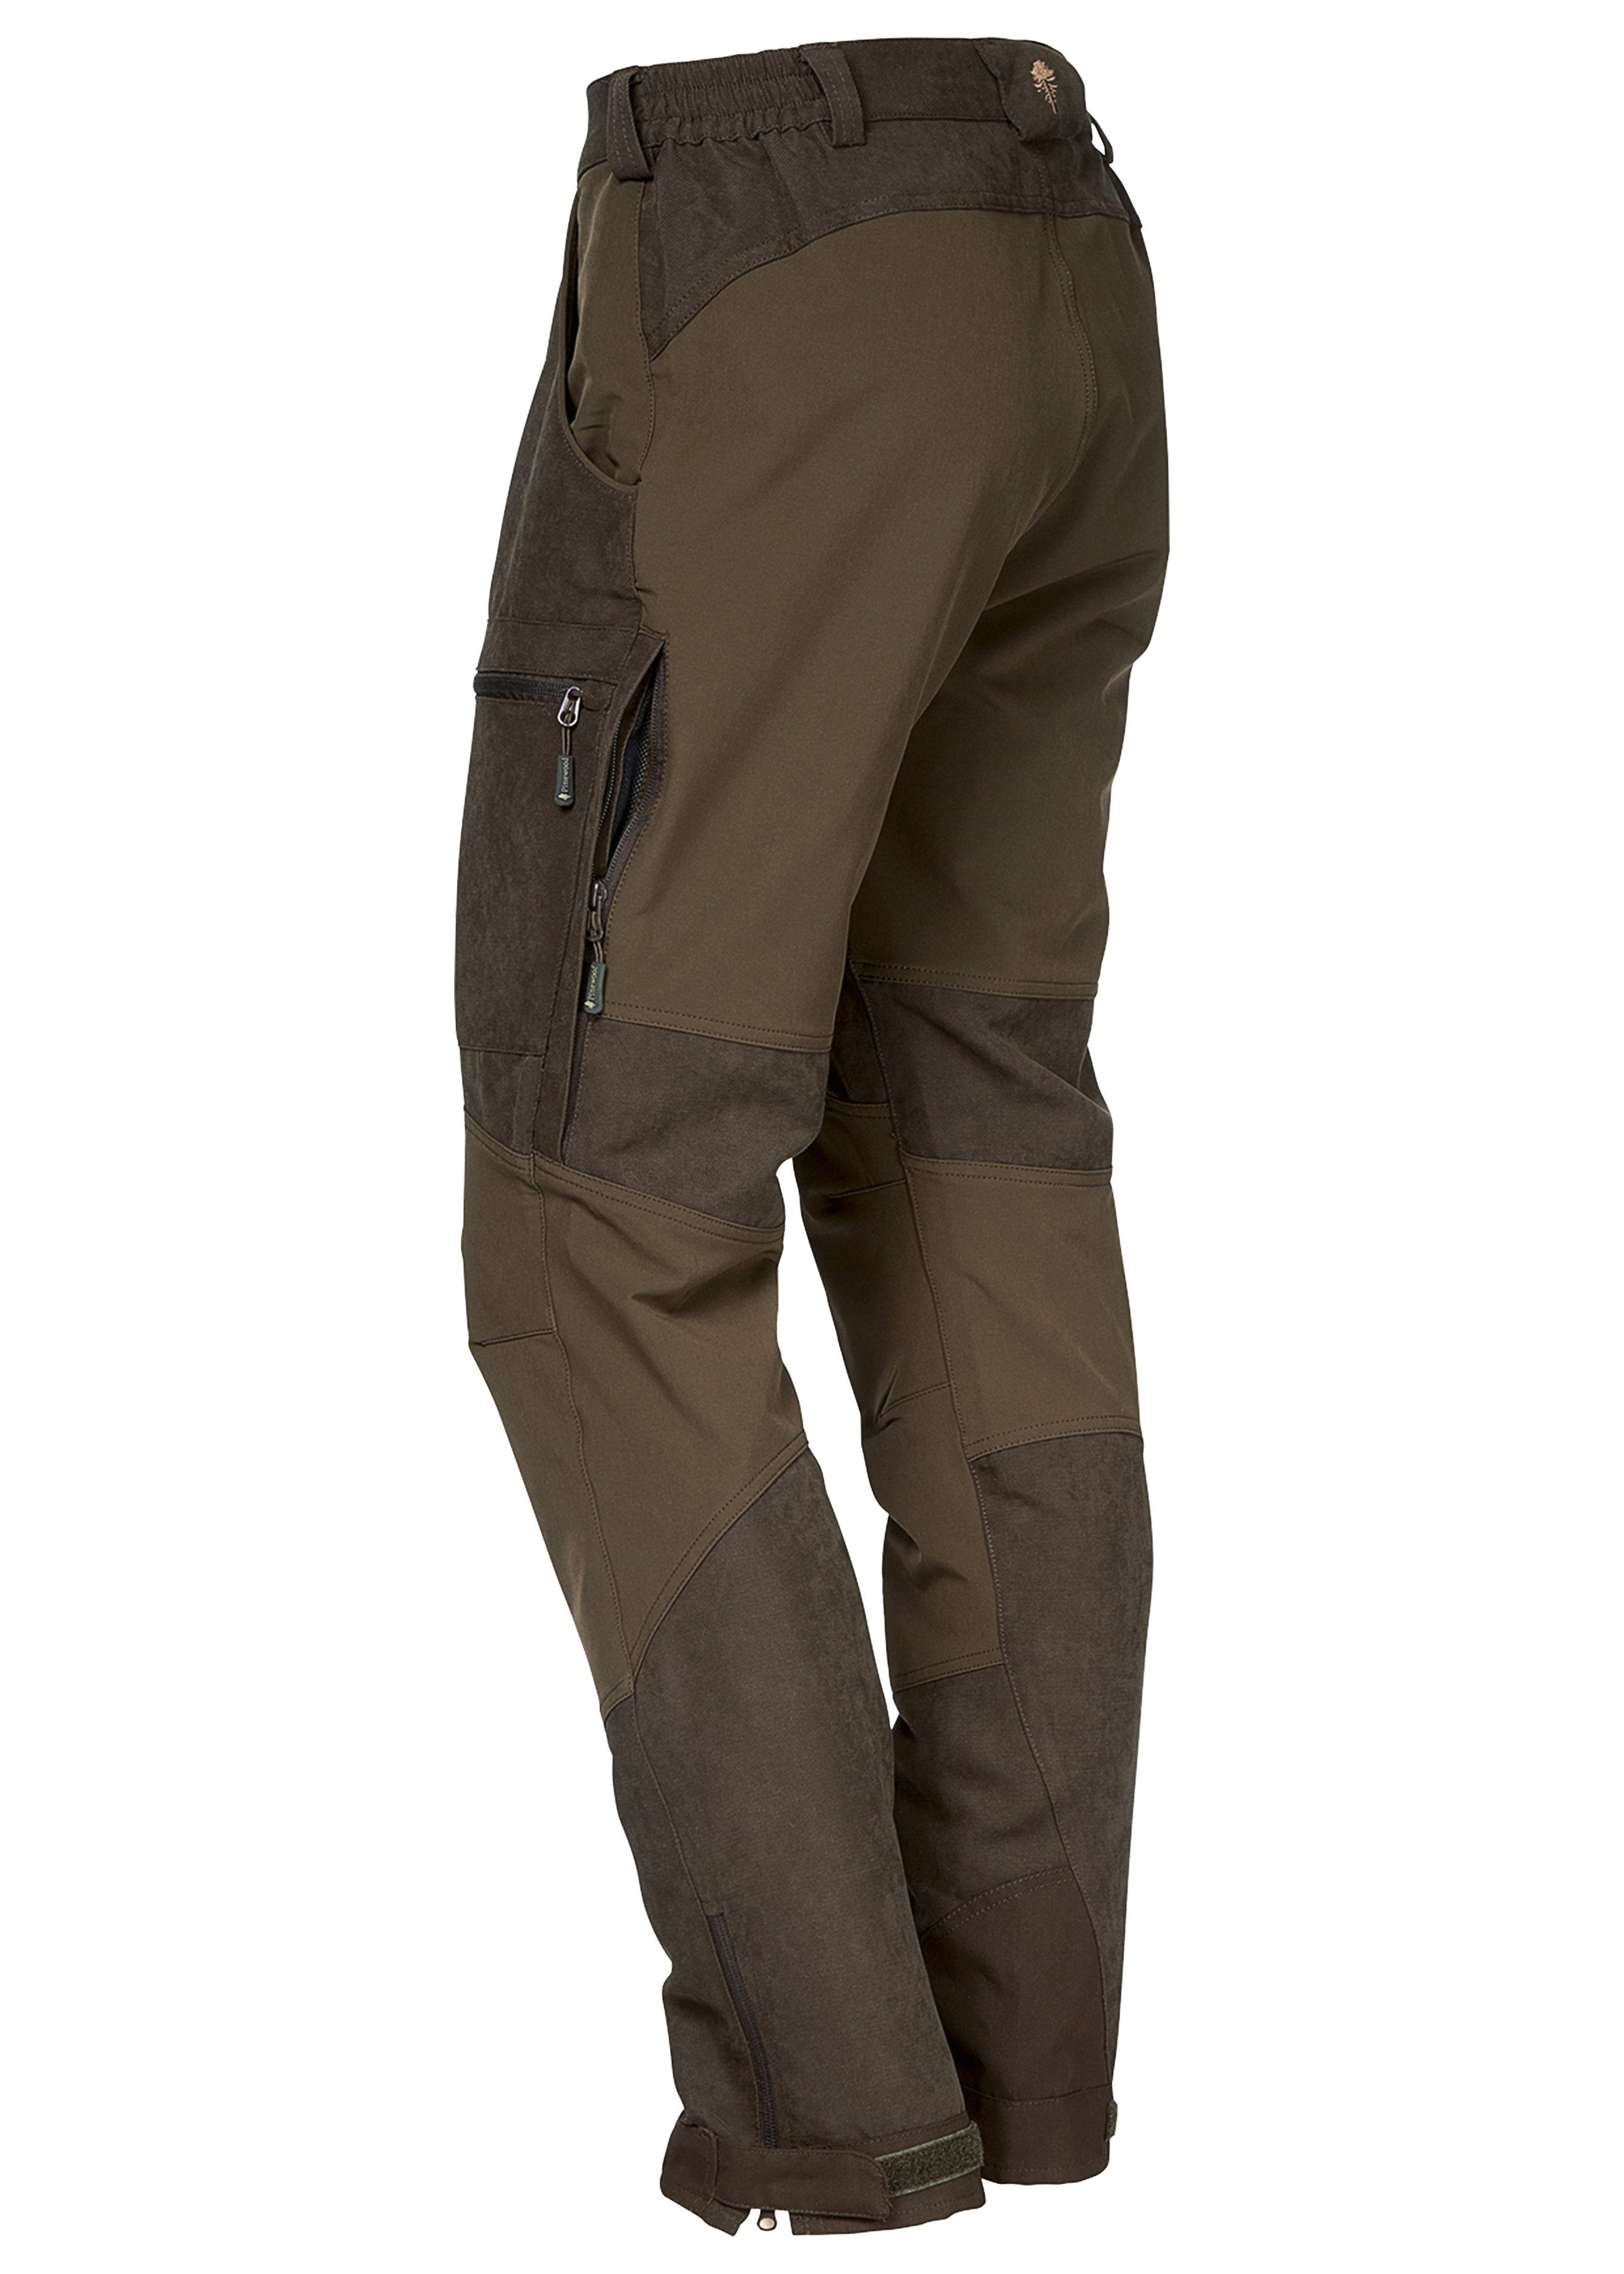 Pinewood Jagd-Stretchhose Caribou 21032440 1